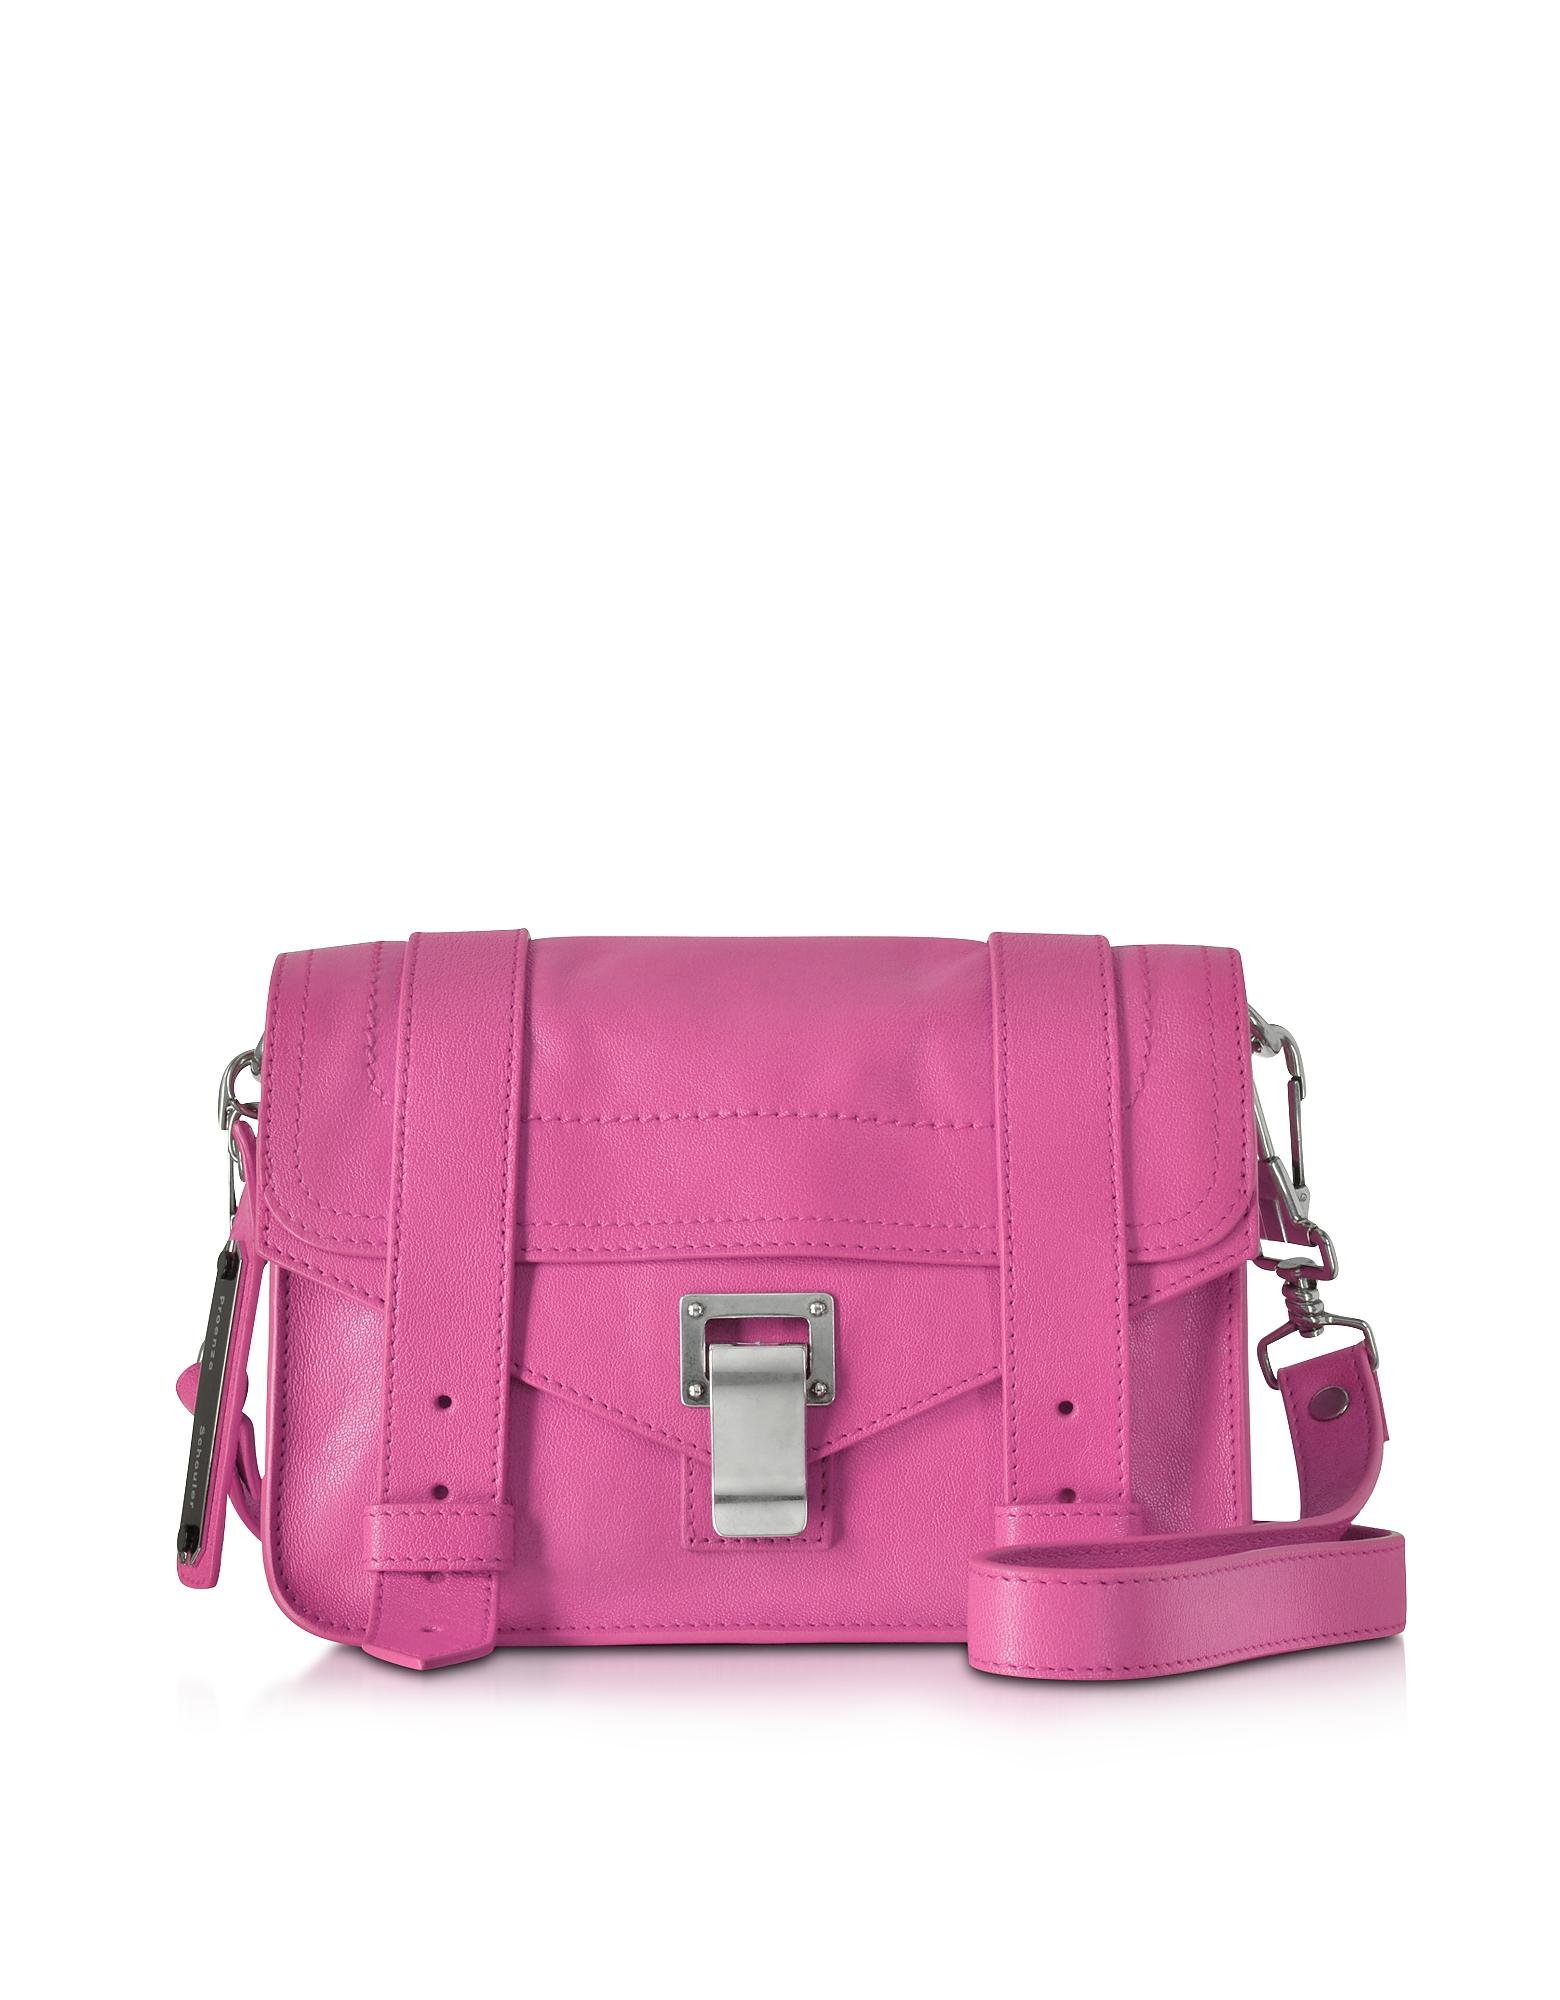 Proenza Schouler Handbags, Lux Leather Ps1 Mini Crossbody